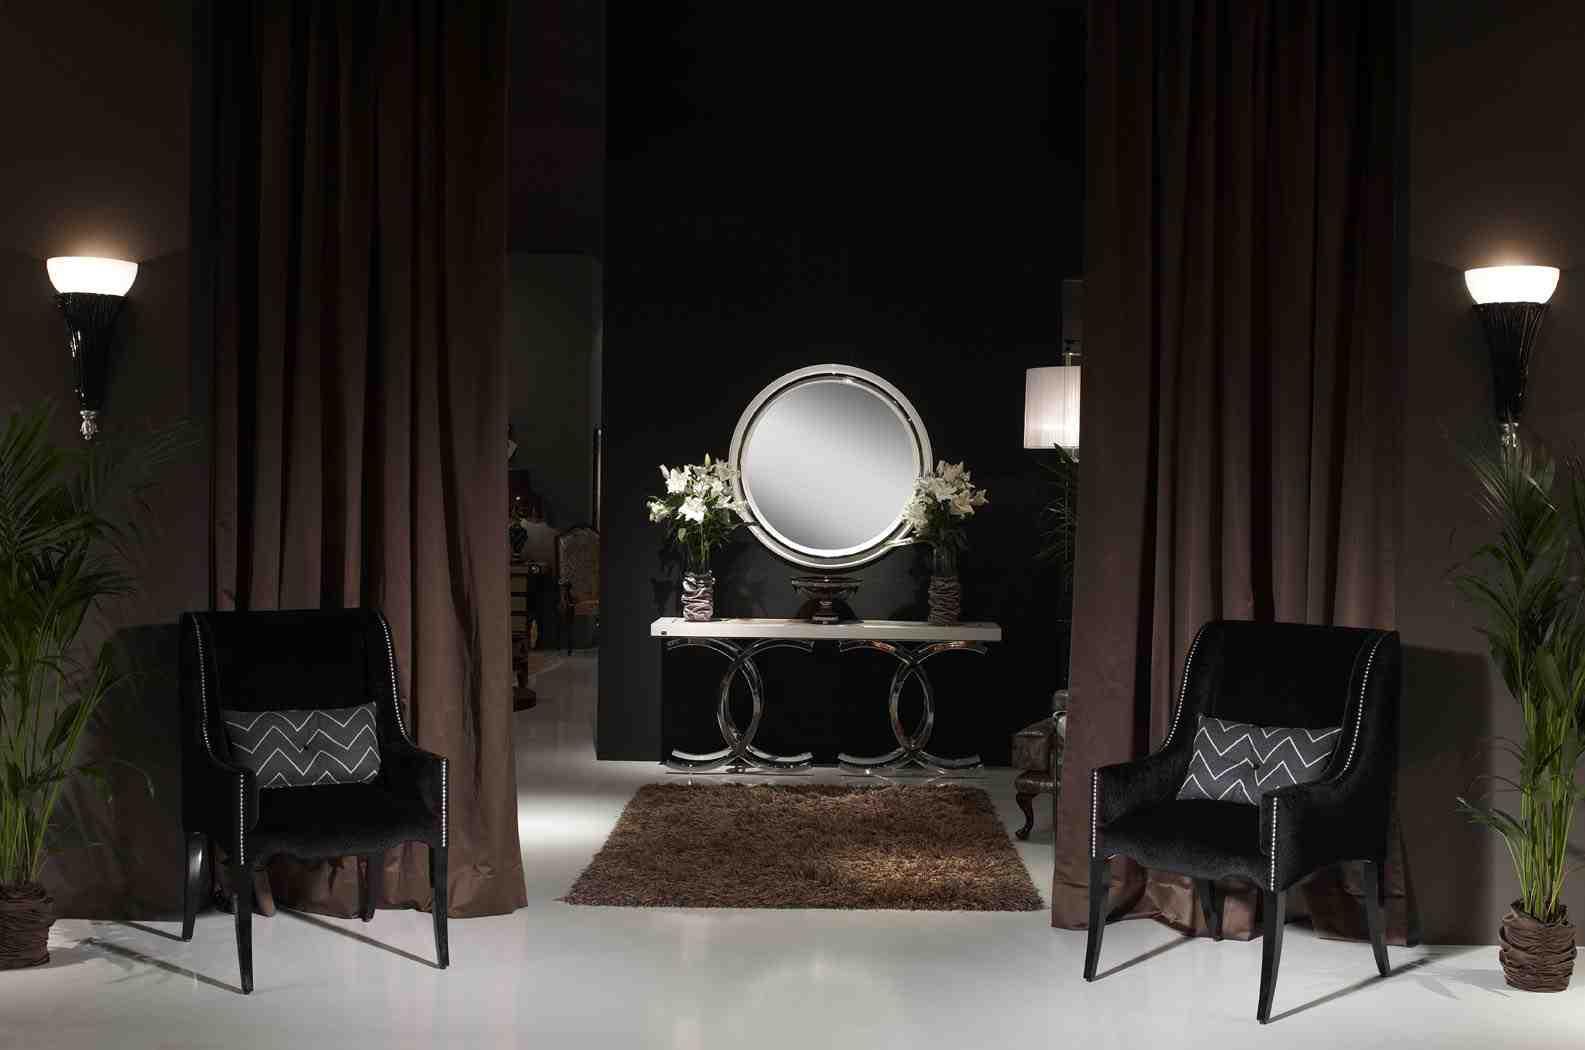 Antique italian classic furniture furniture design for Classic design furniture